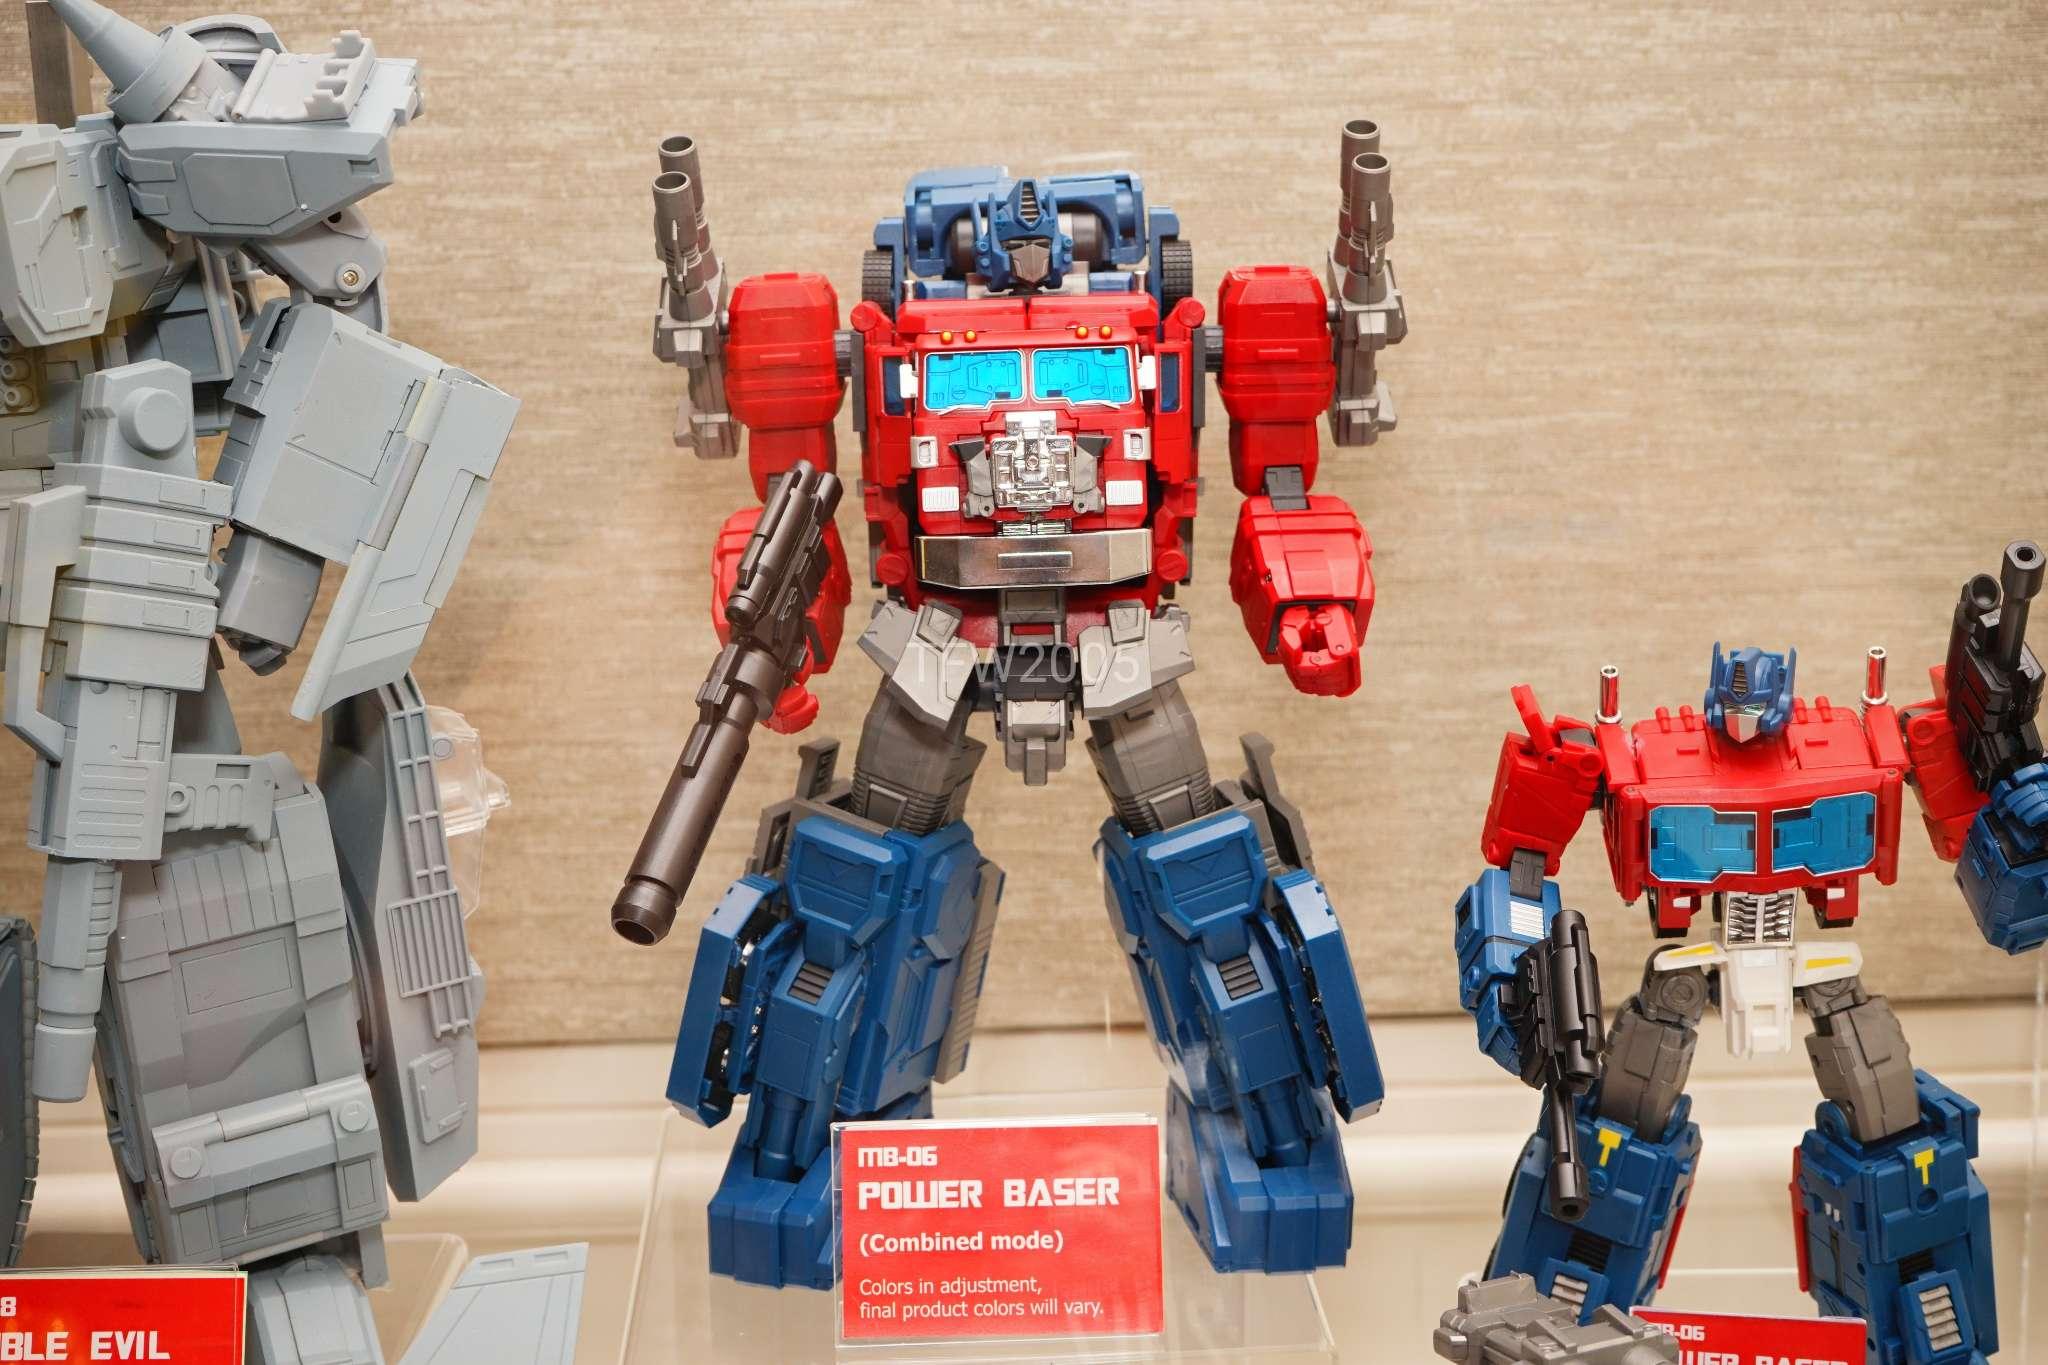 [FansHobby] Produit Tiers - MB-06 Power Baser (aka Powermaster Optimus) + MB-11 God Armour (aka Godbomber) - TF Masterforce - Page 2 V0AwQC9x_o